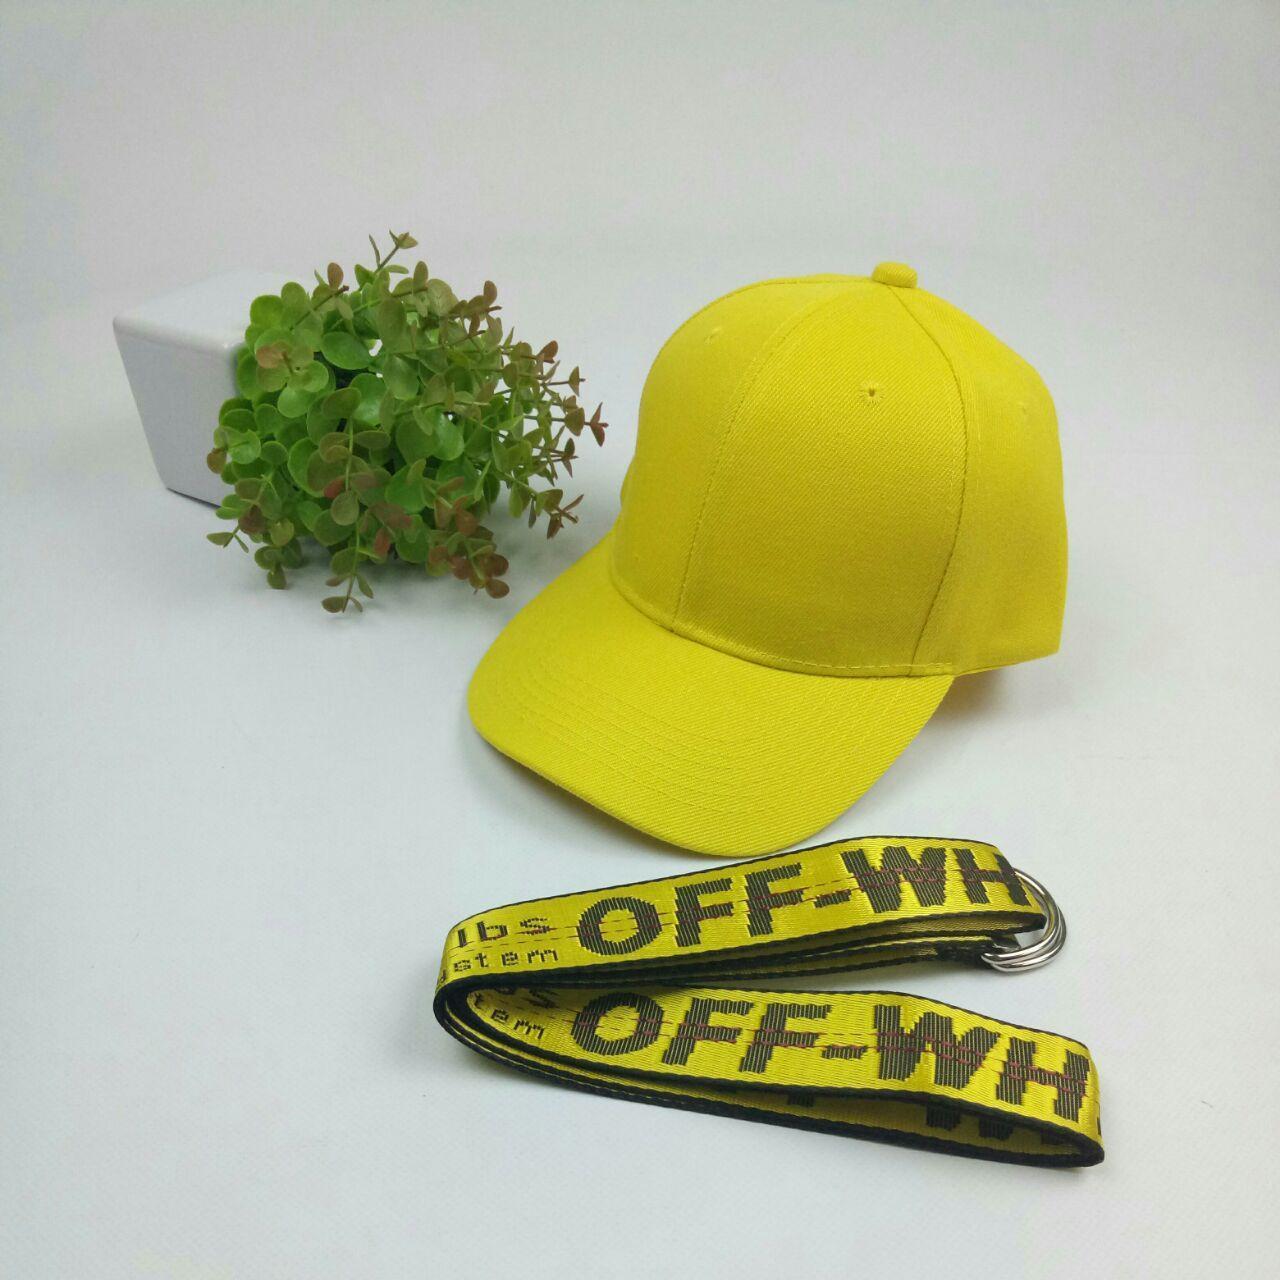 Комплект Кепка бейсболка Style (желтая) + ремень пояс Off-White